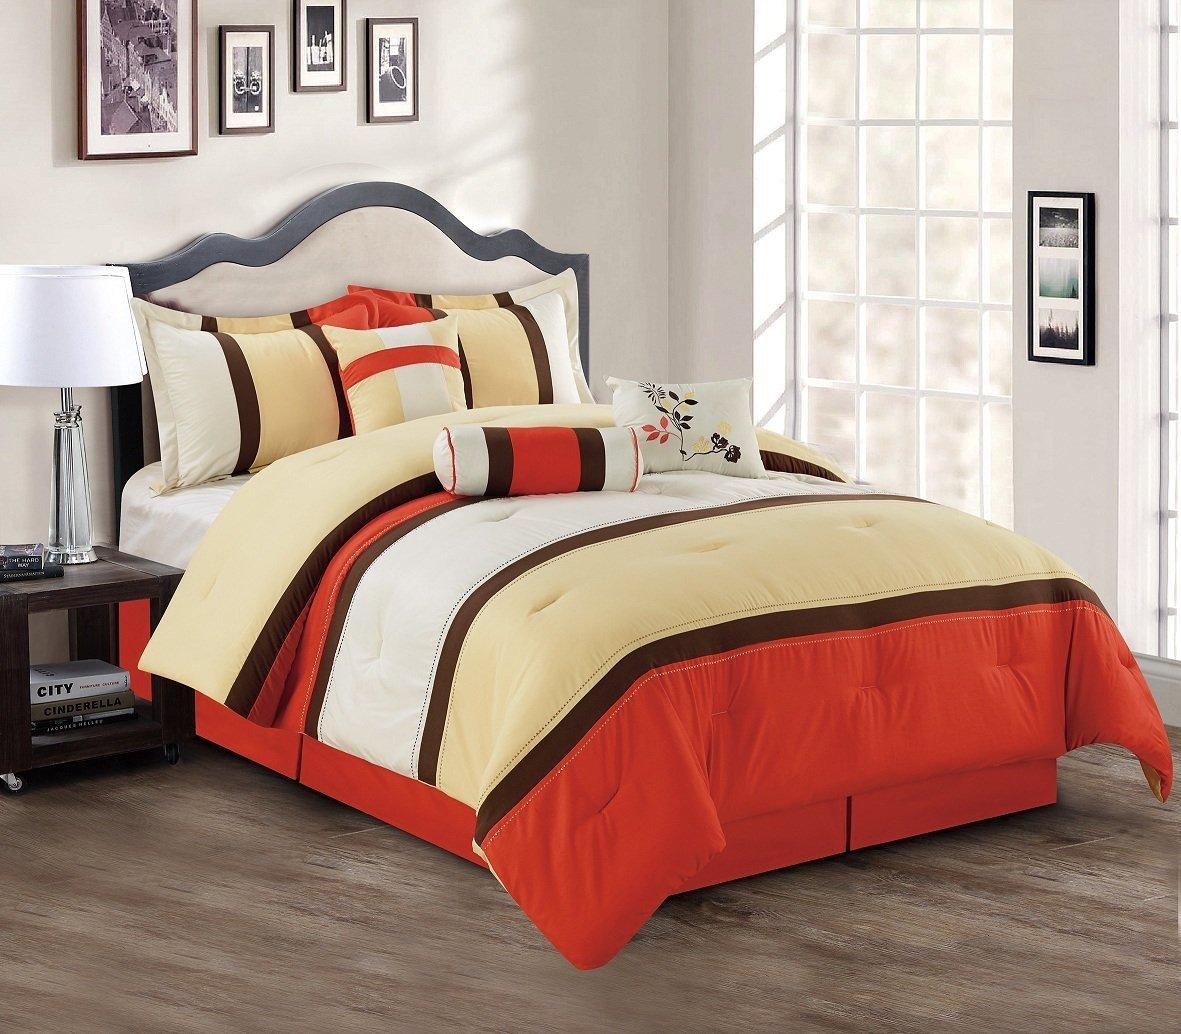 Bright to Burnt Orange and Brown Comforter & Bedding Sets